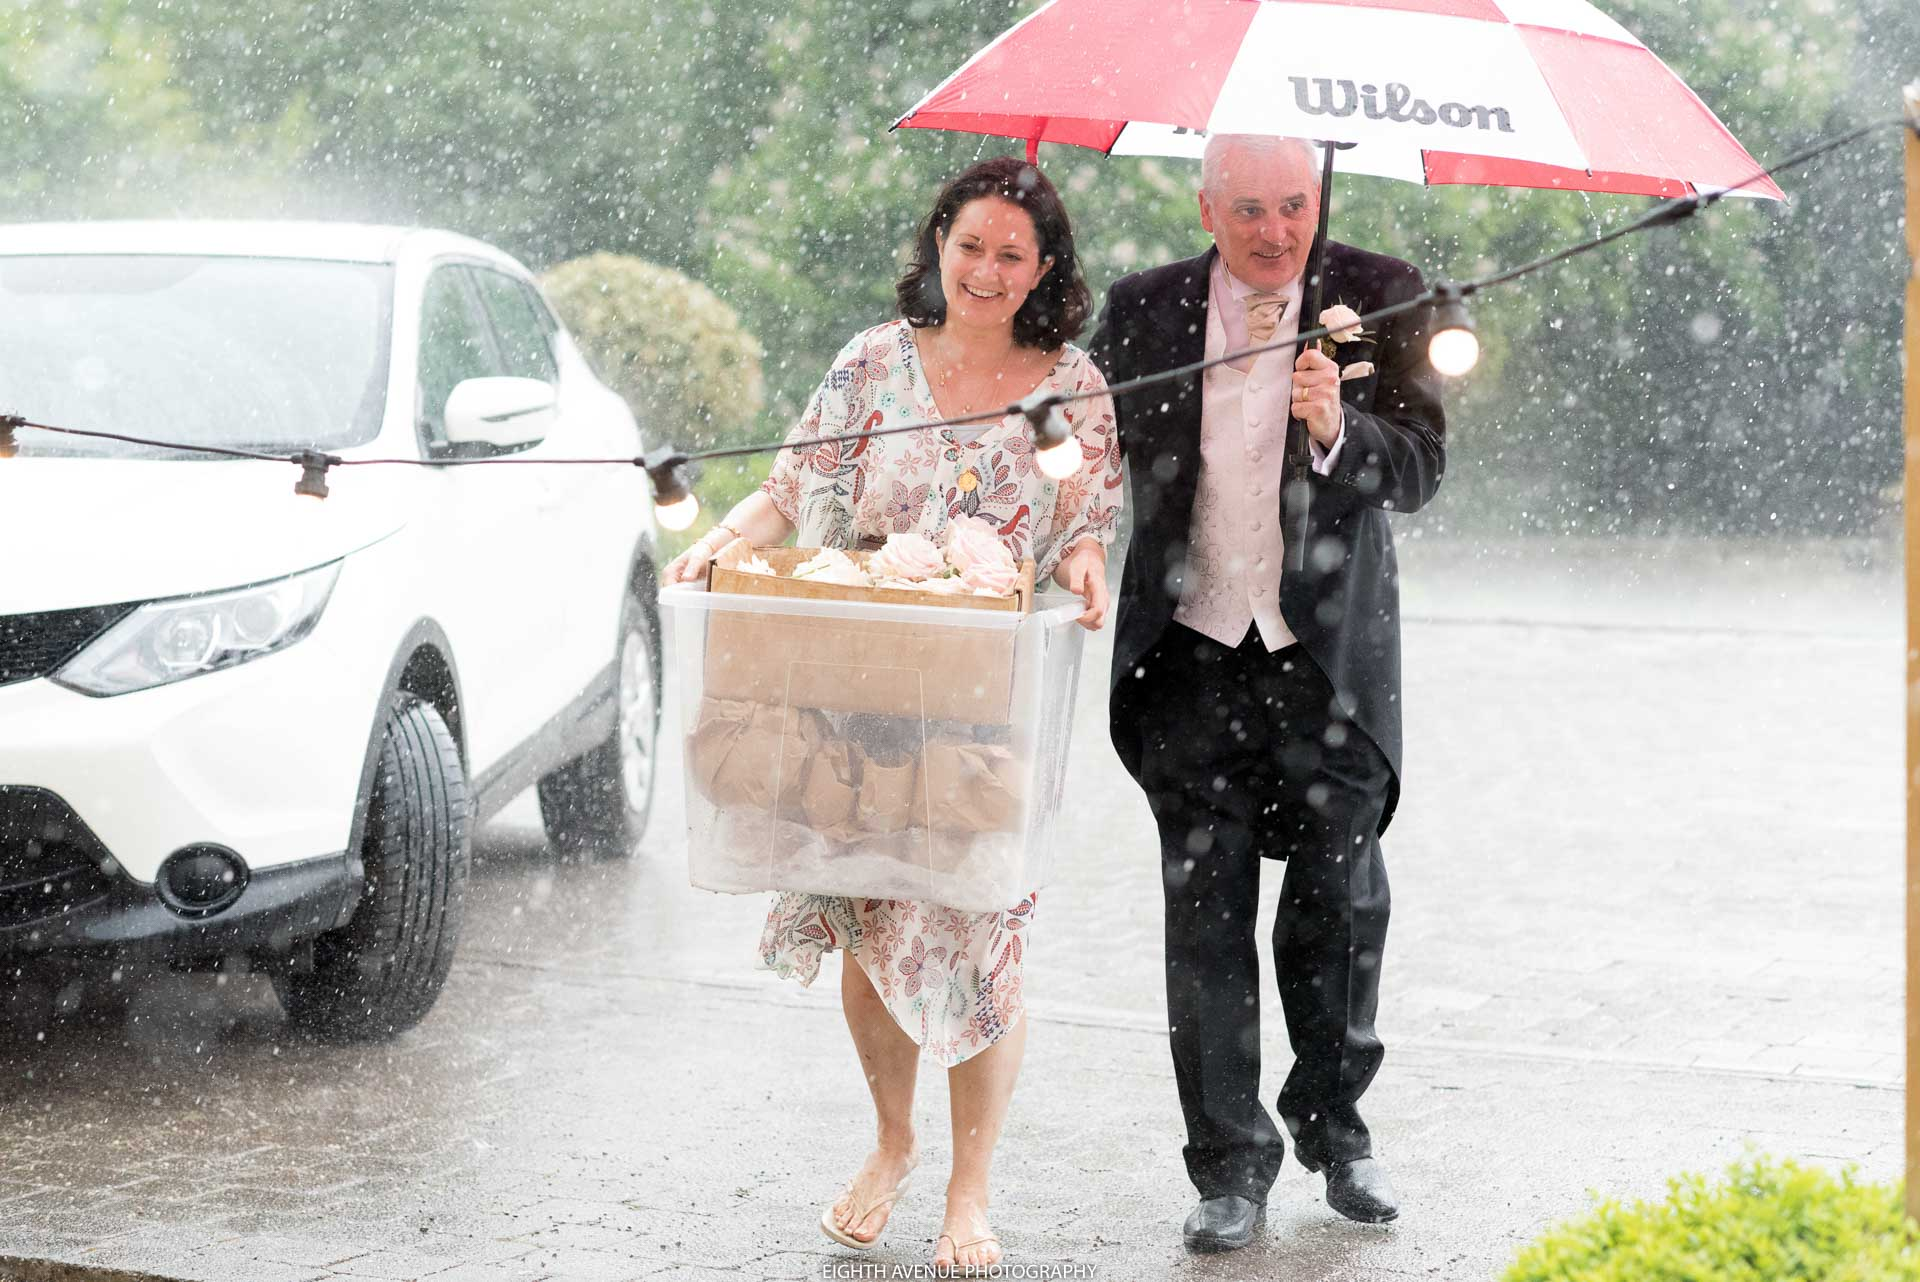 Guests walking in rain